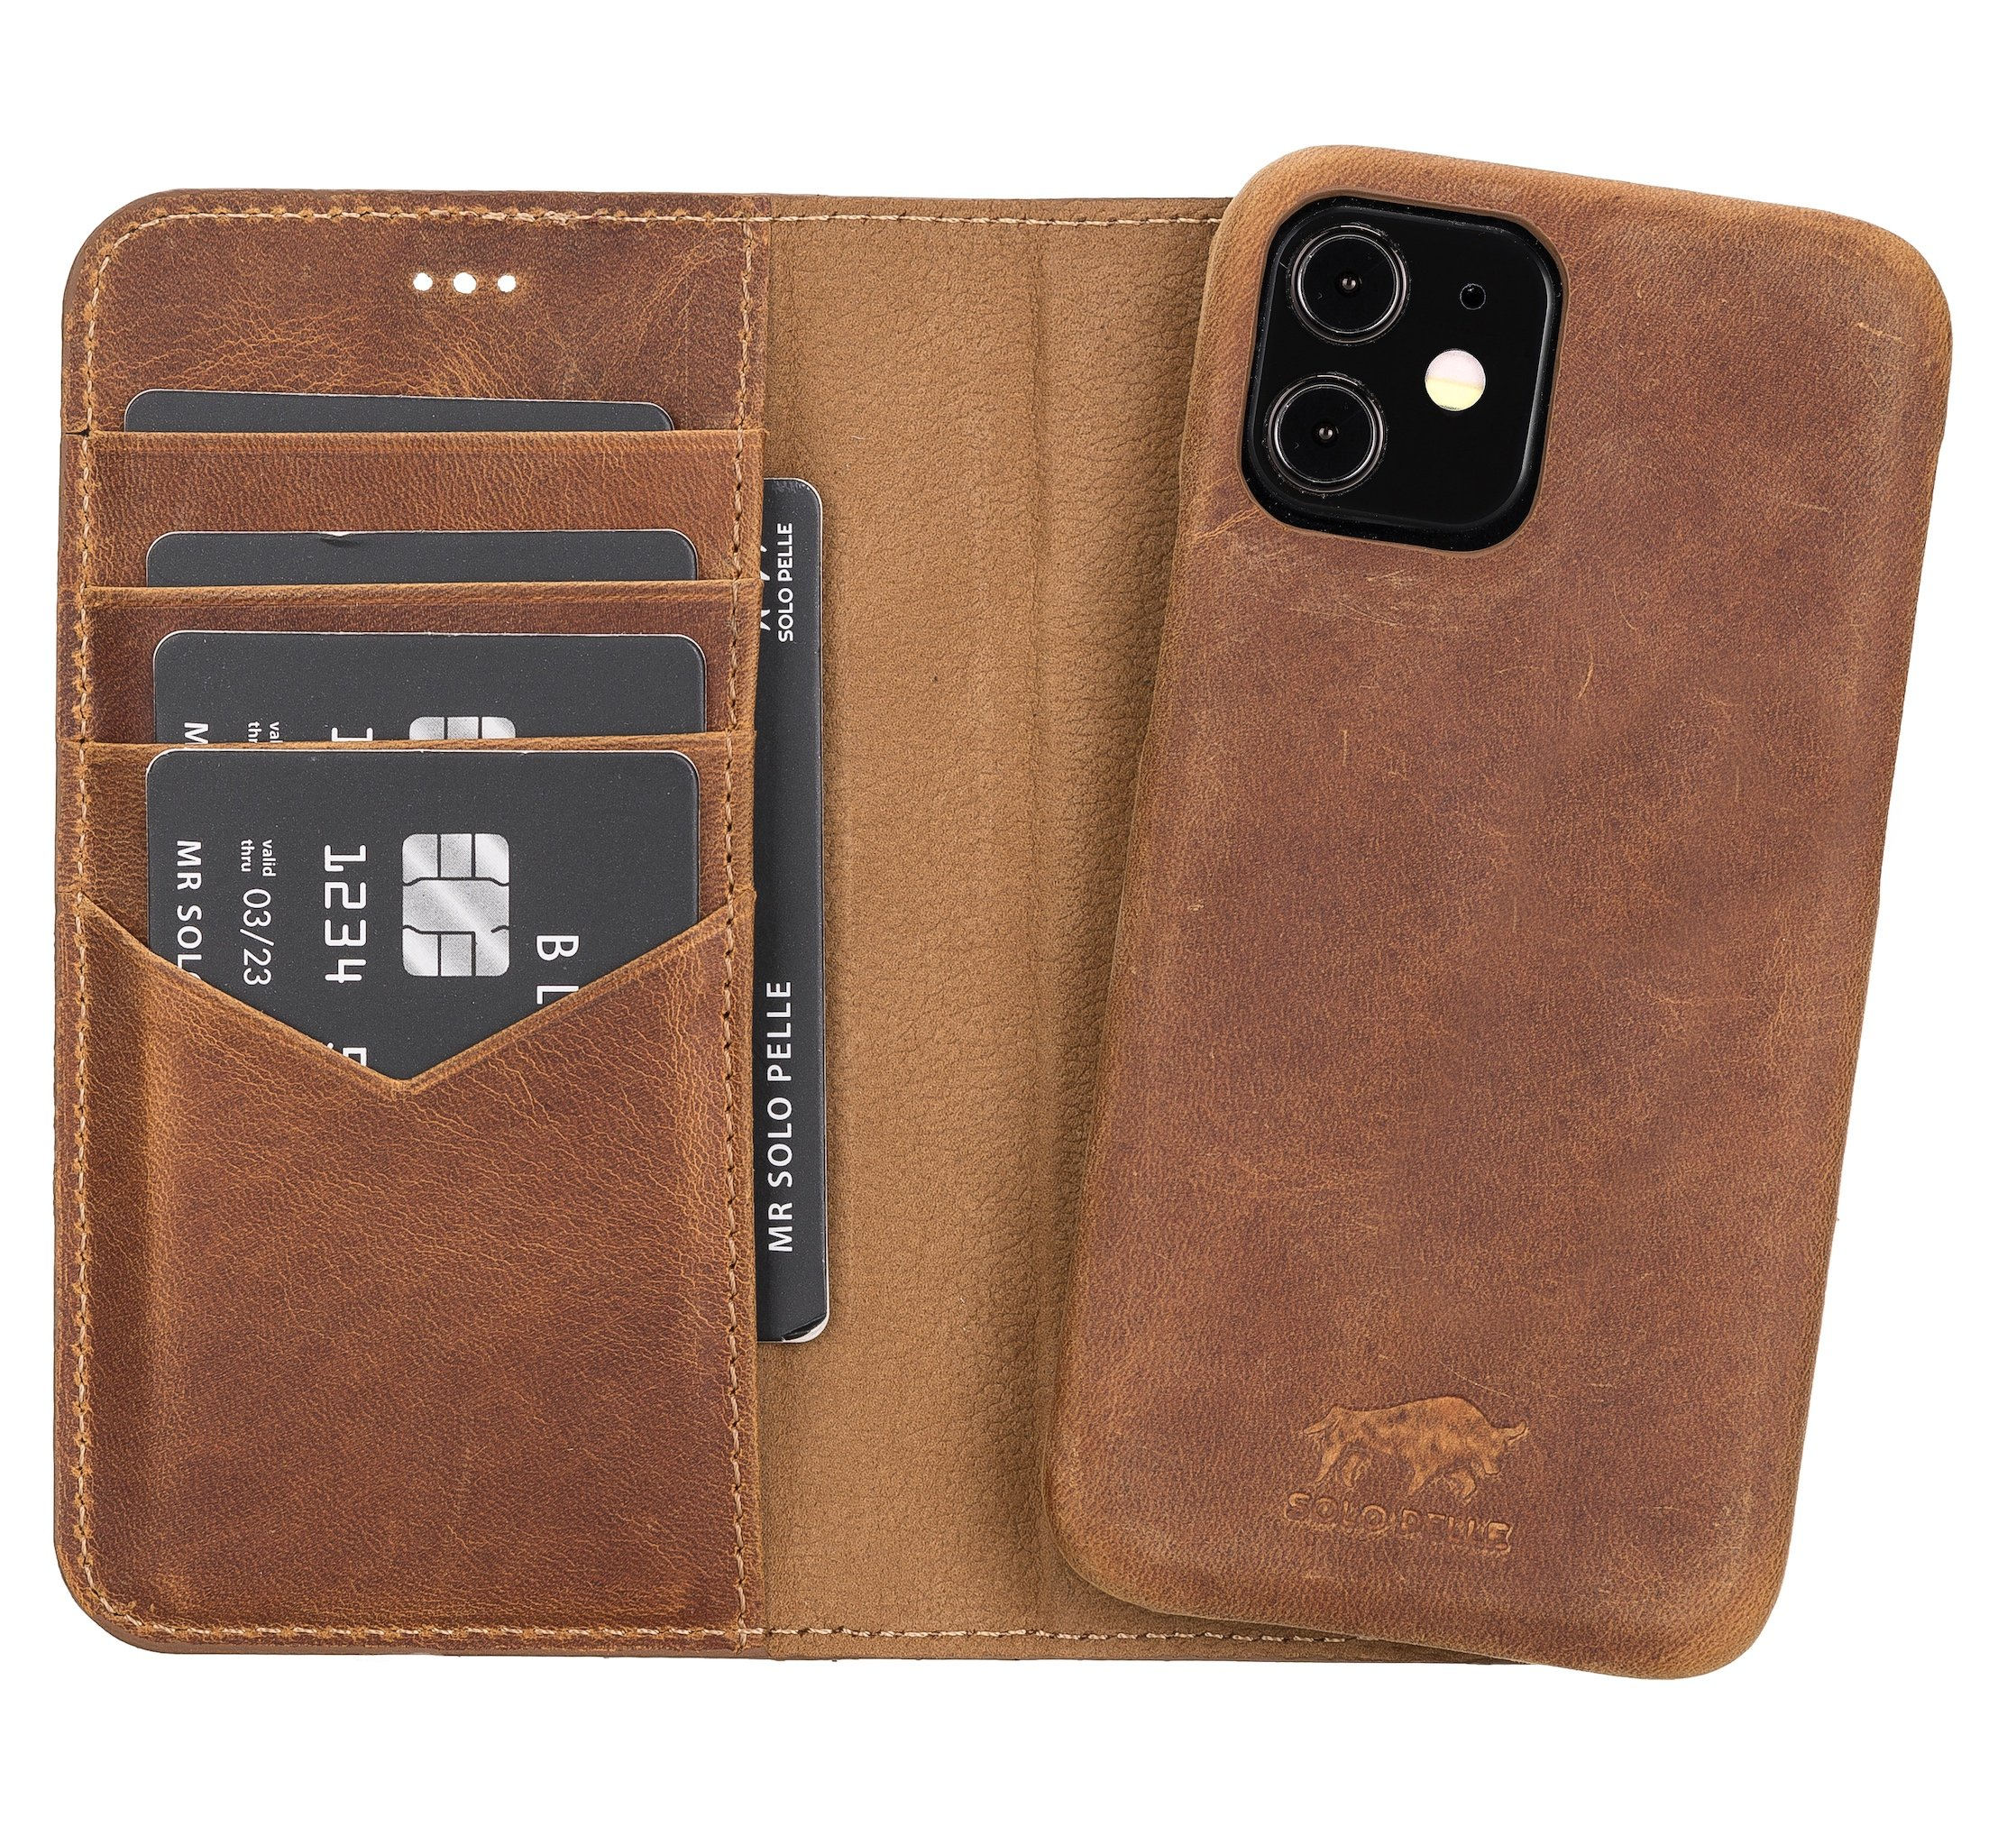 "iPhone 12 Mini abnehmbare Lederhülle ""Clemson"" MagSafe kompatibel (Vollleder Camel Braun)"